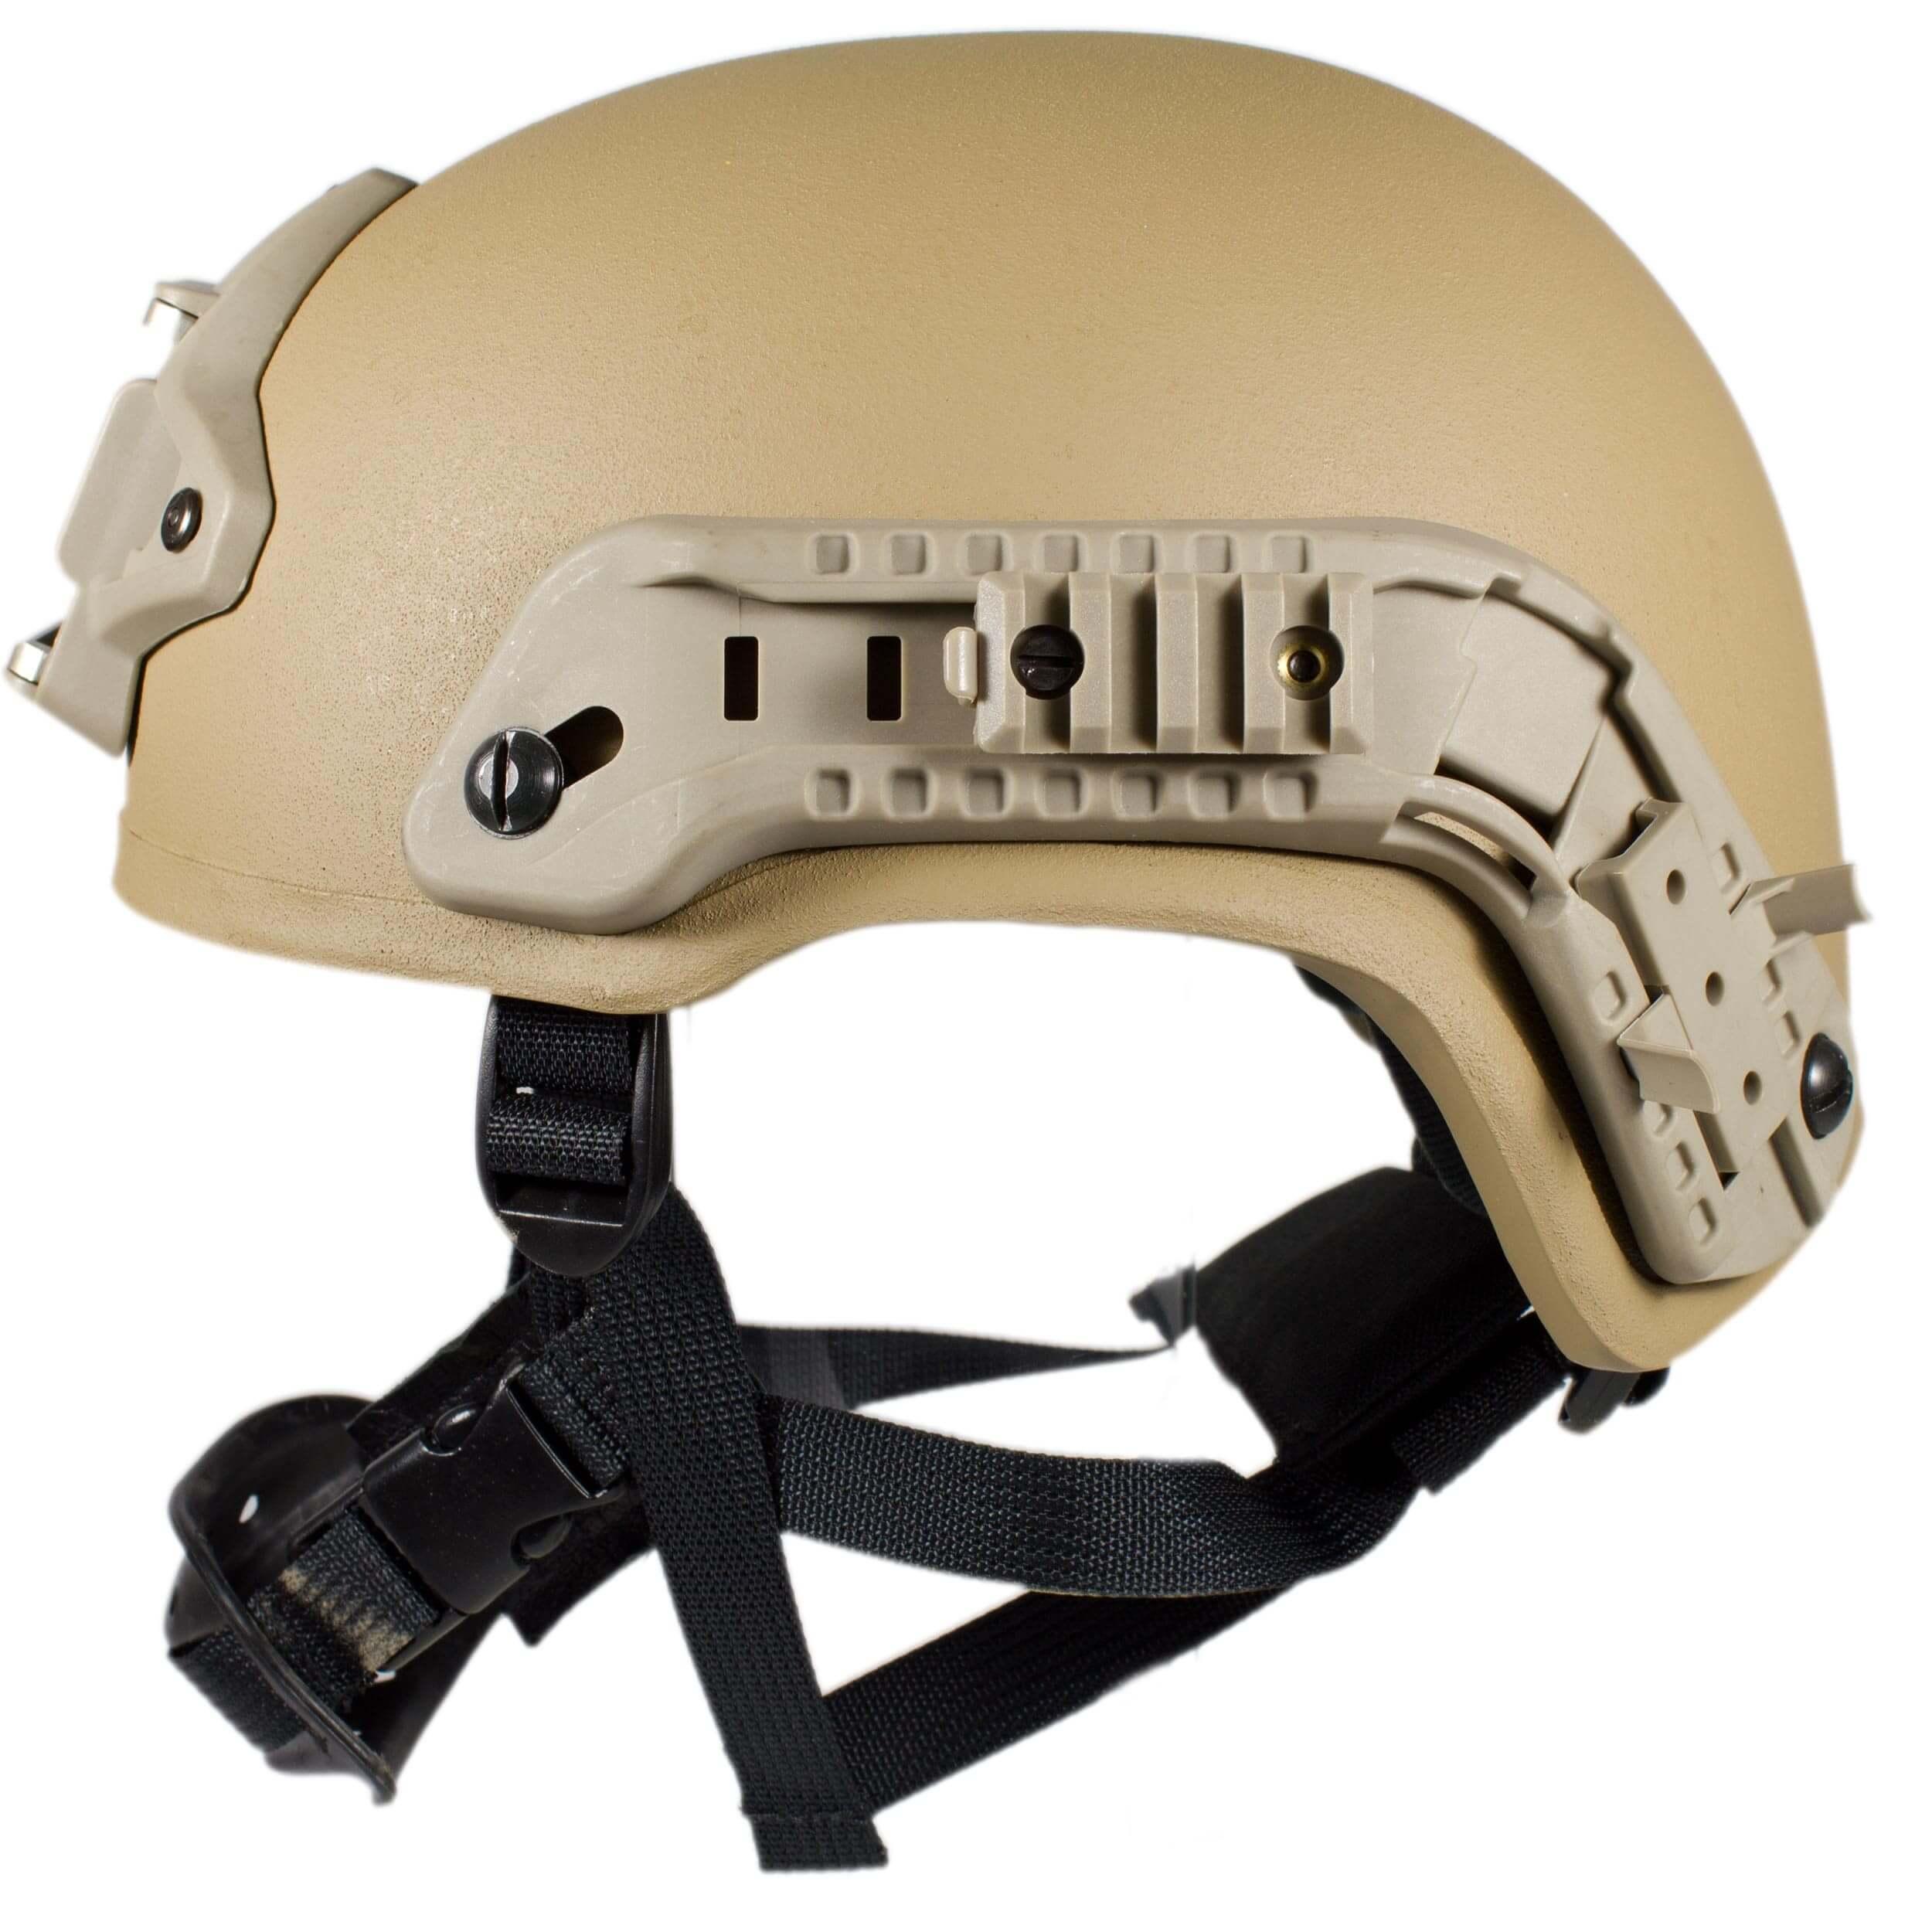 HCS Viper 3 Helm mit Rails NVG Mount und Pad coyote